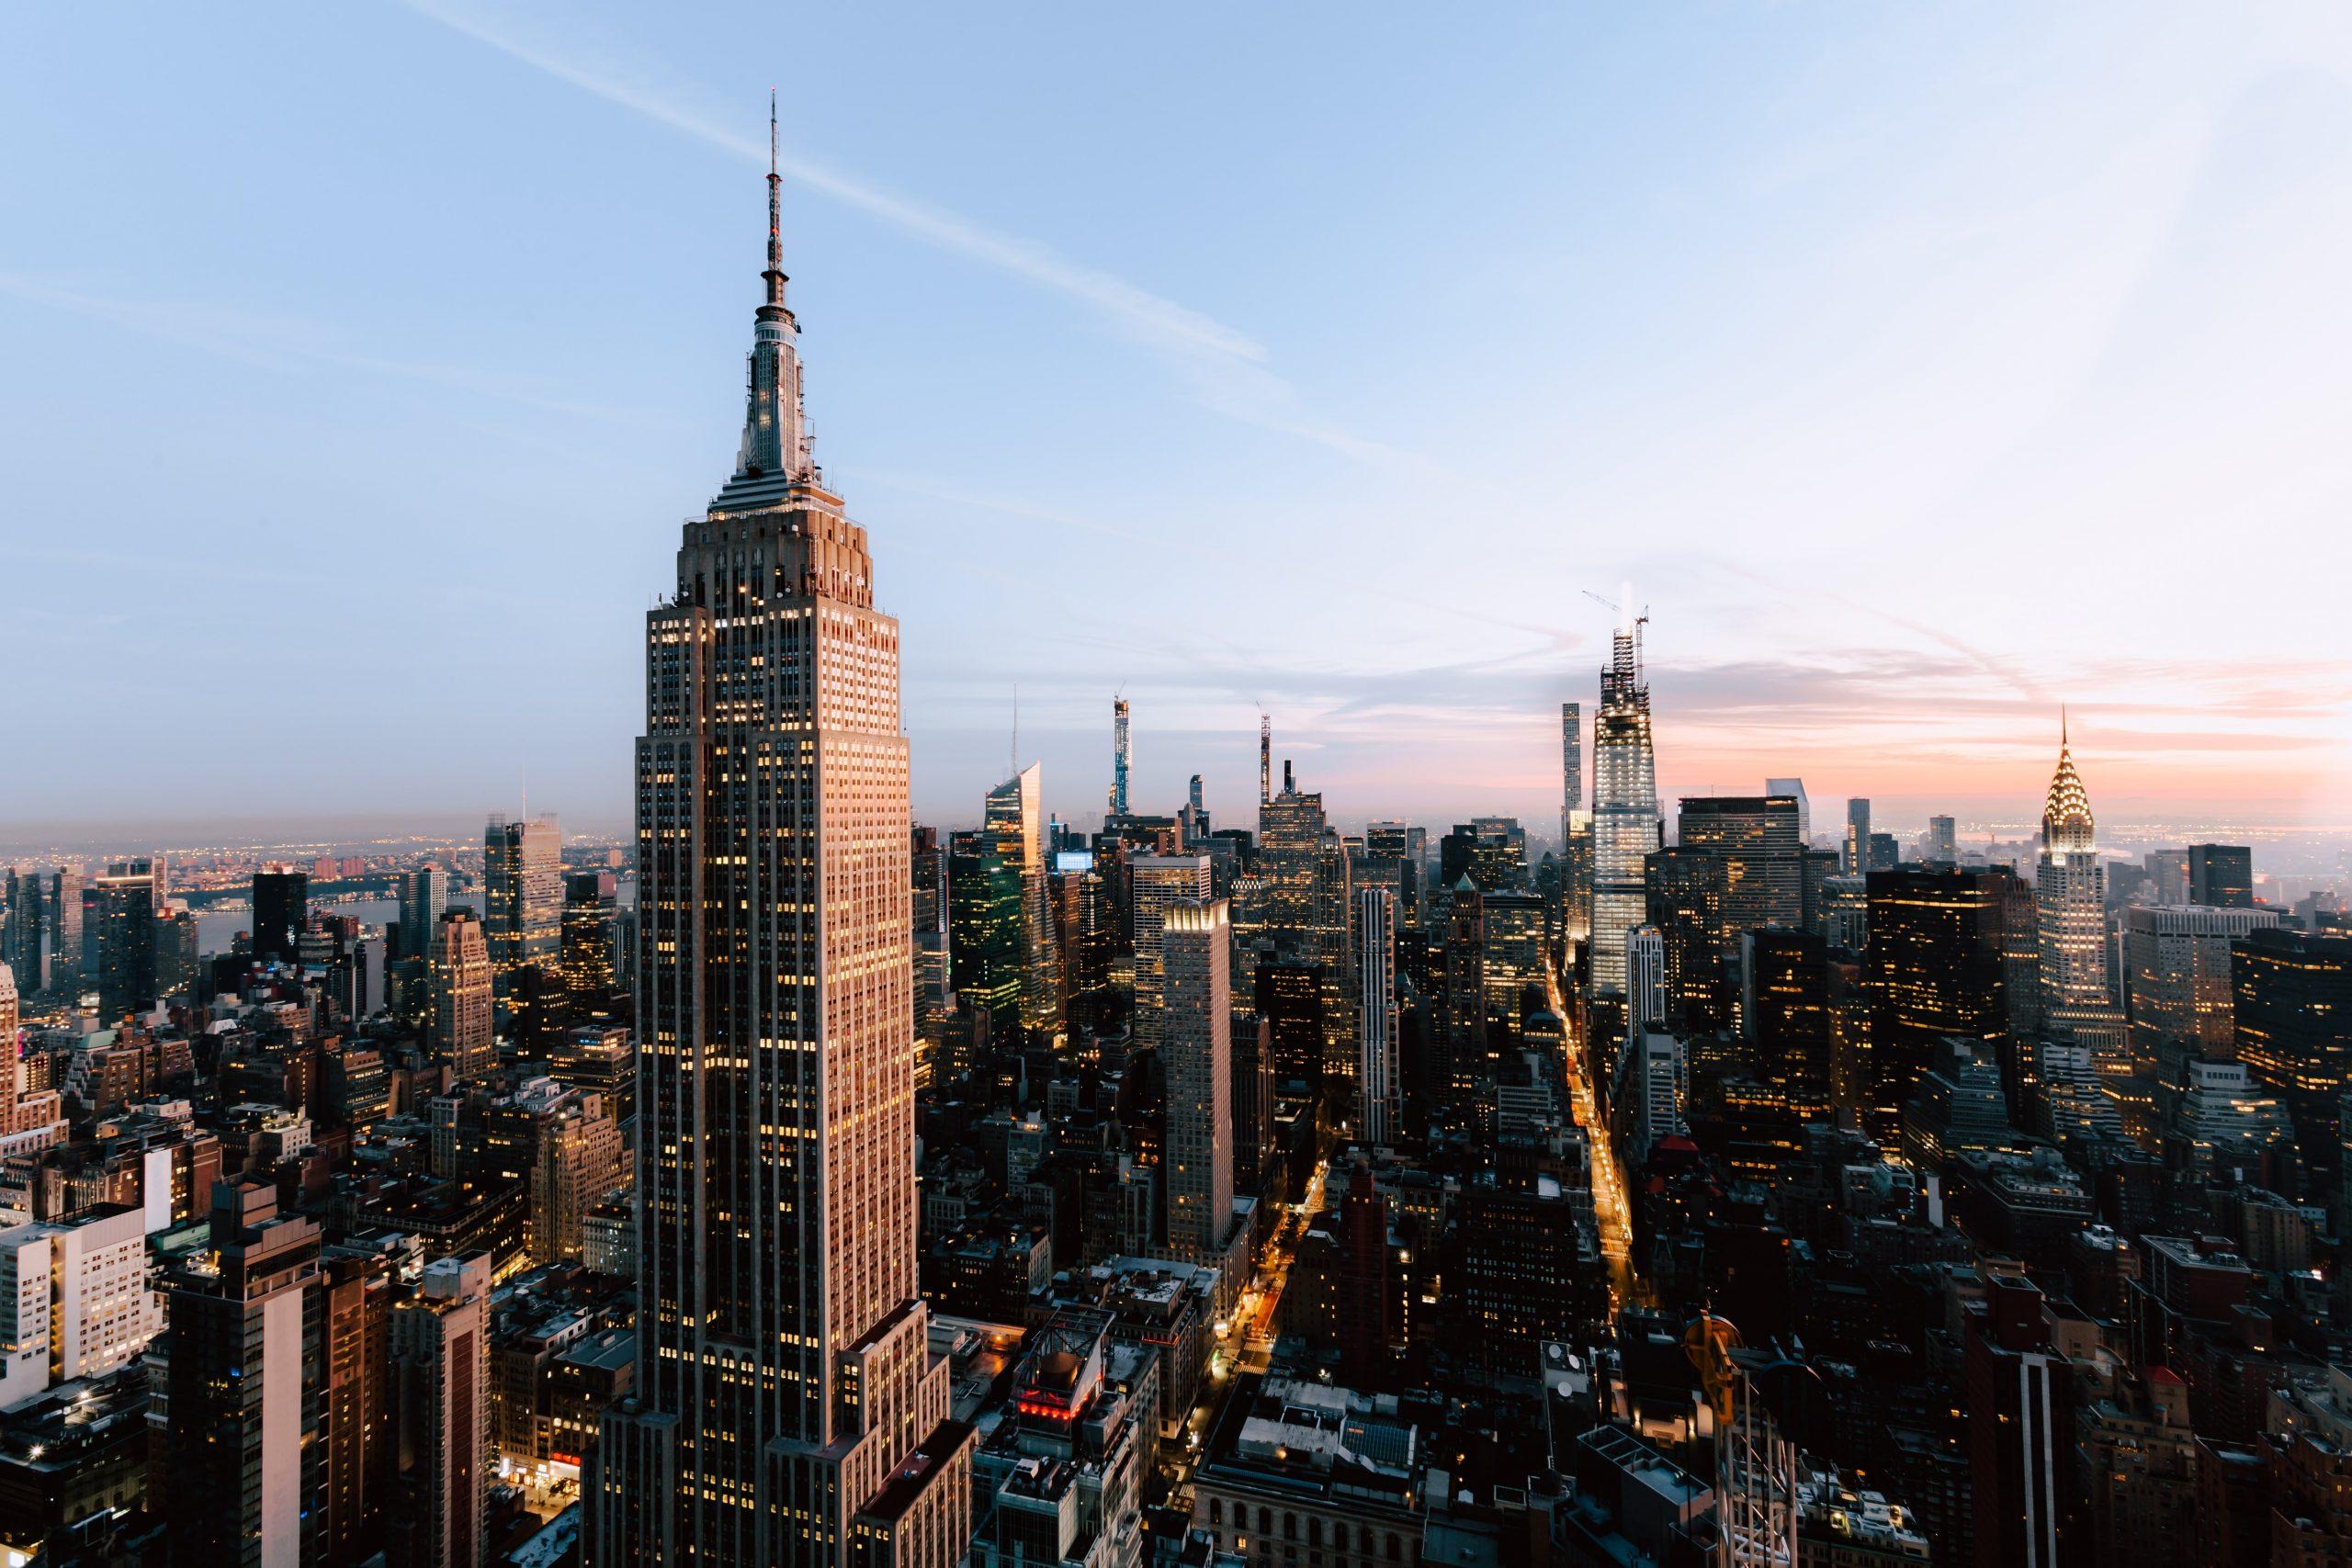 Bioptic Laws in New York